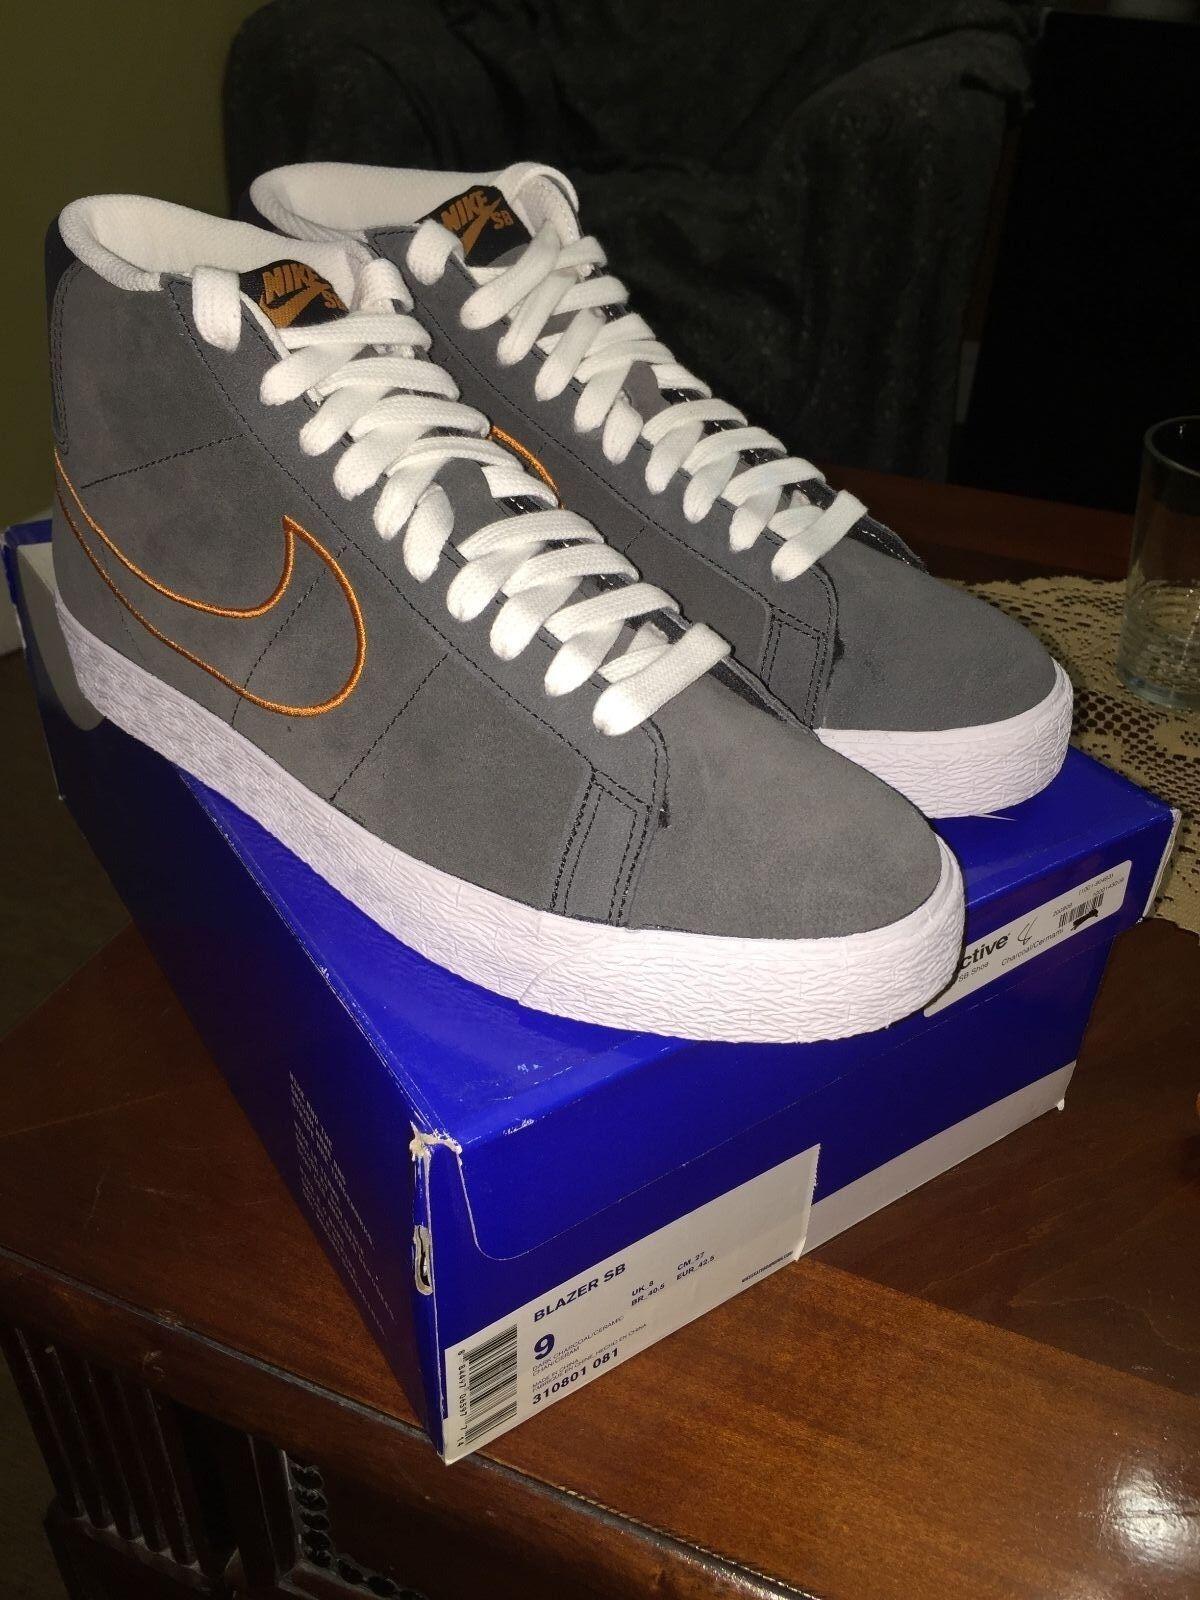 Nike SB blazer dark charcoal ceramic RARE 2009 310801 081 sz 9 11 supreme Jordan